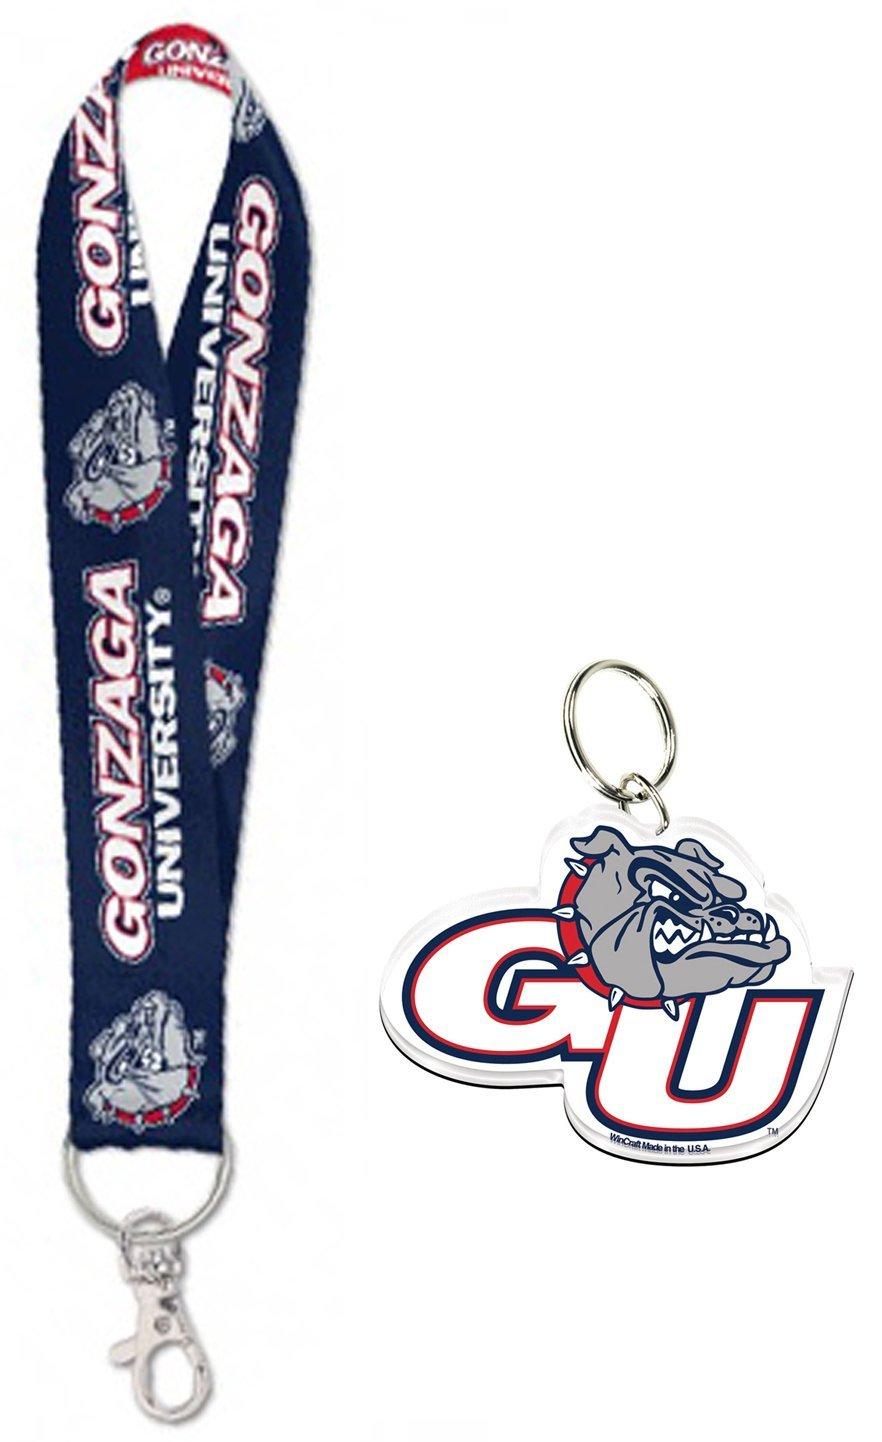 WinCraft Bundle 2 Items: Gonzaga University Bulldogs 1 Key Strap Key Chain and 1 Premium Key Ring/Zipper Pull